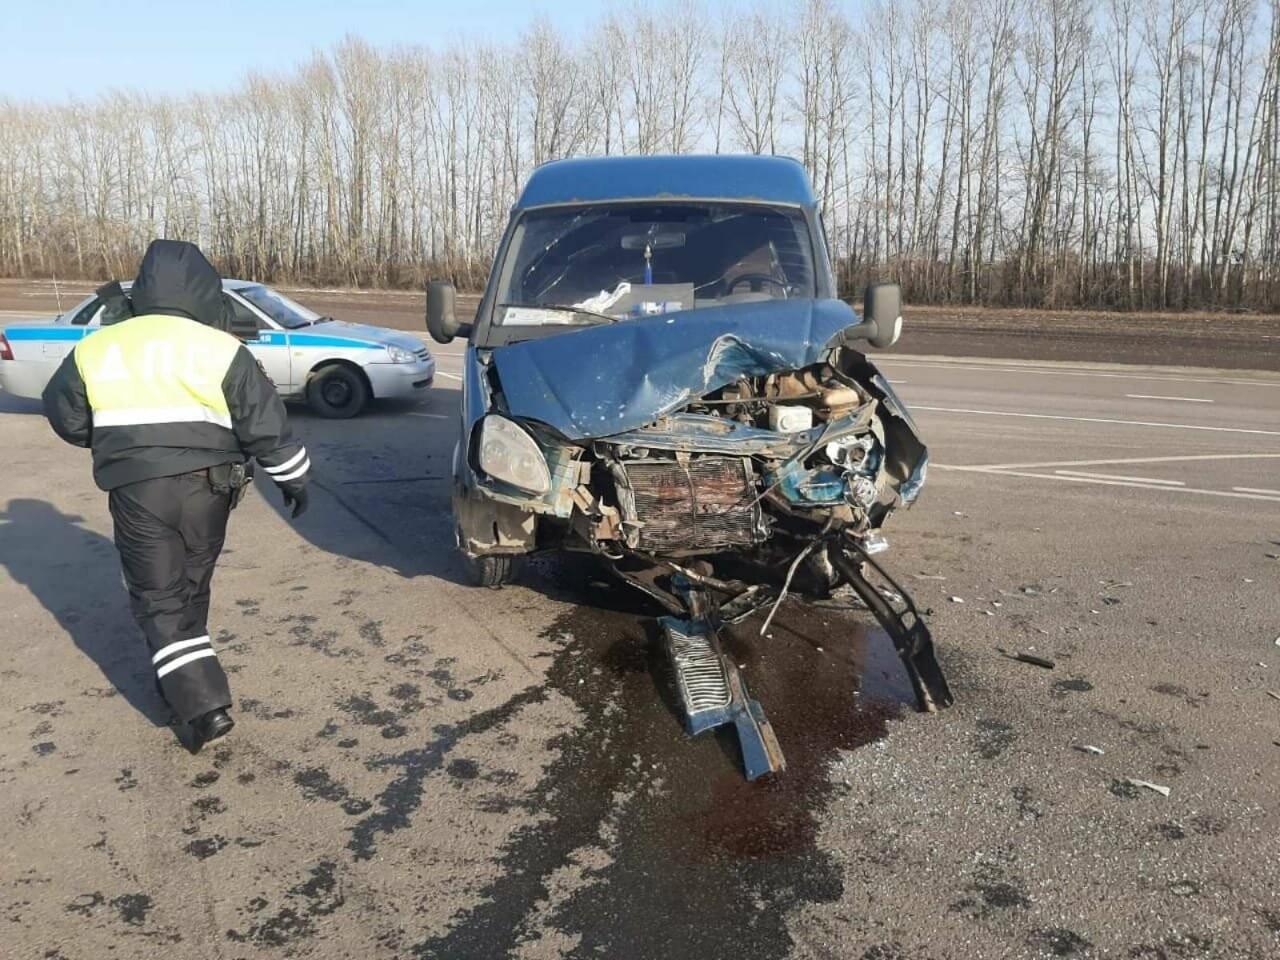 На трассе «Тамбов-Воронеж» при столкновении «ГАЗели» и такси пострадали двое, фото-1